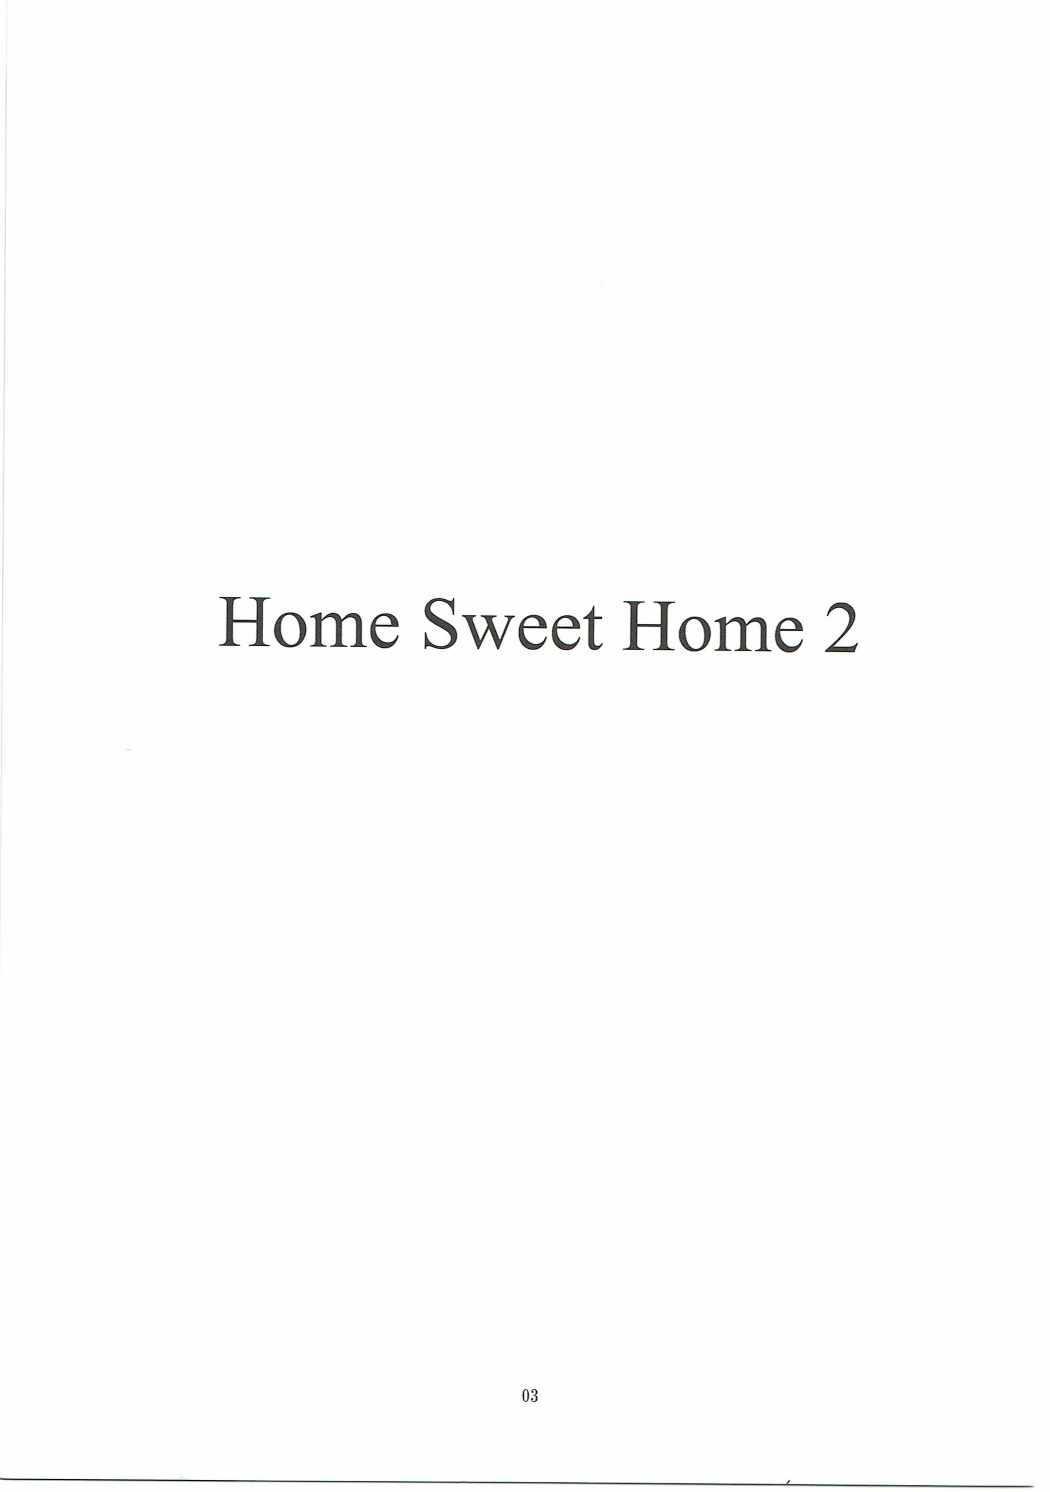 Home Sweet Home 2 1